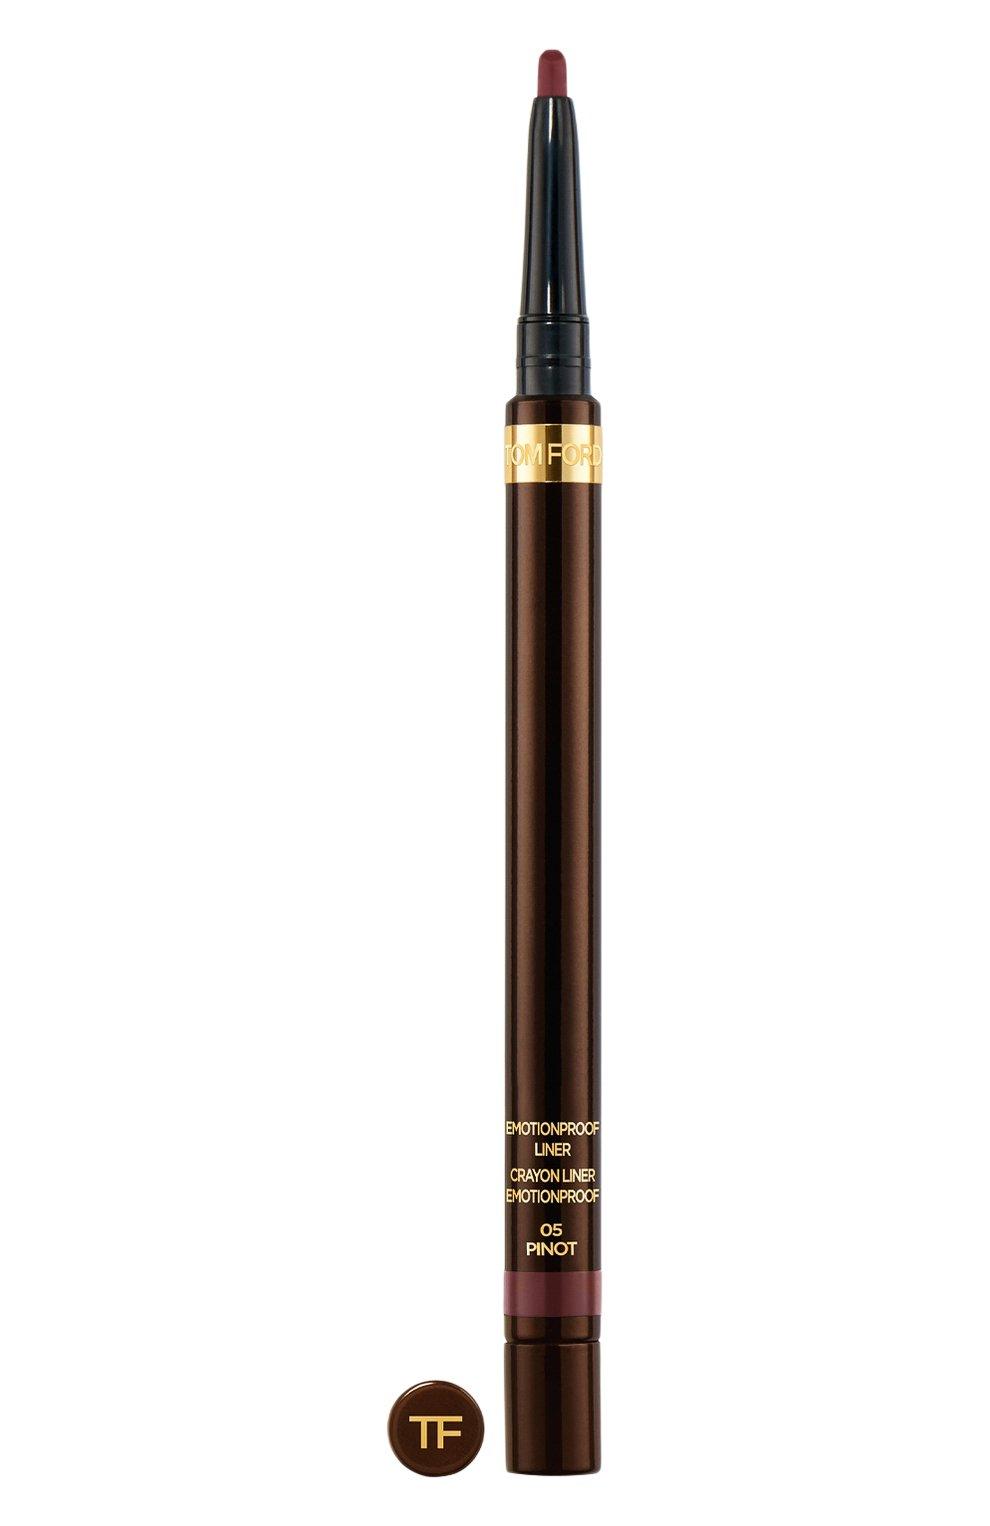 Женский карандаш для глаз emotionproof, оттенок 05 pinot TOM FORD бесцветного цвета, арт. T6YF-05 | Фото 1